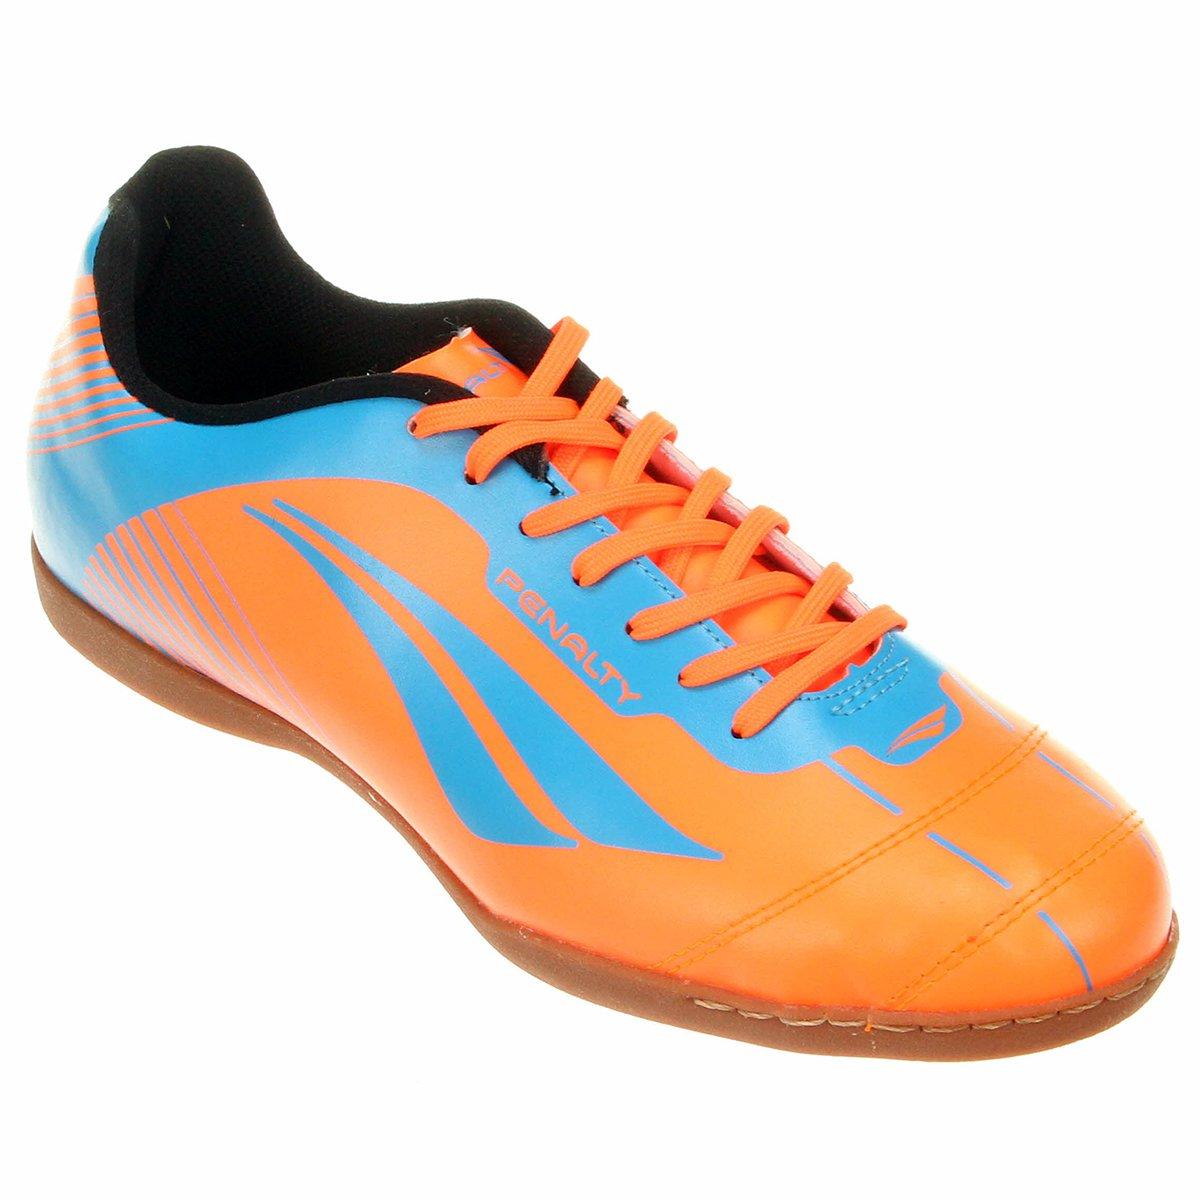 save off 8f2da fd057 Chuteira Penalty Storm 5 Futsal - Compre Agora   Netshoes